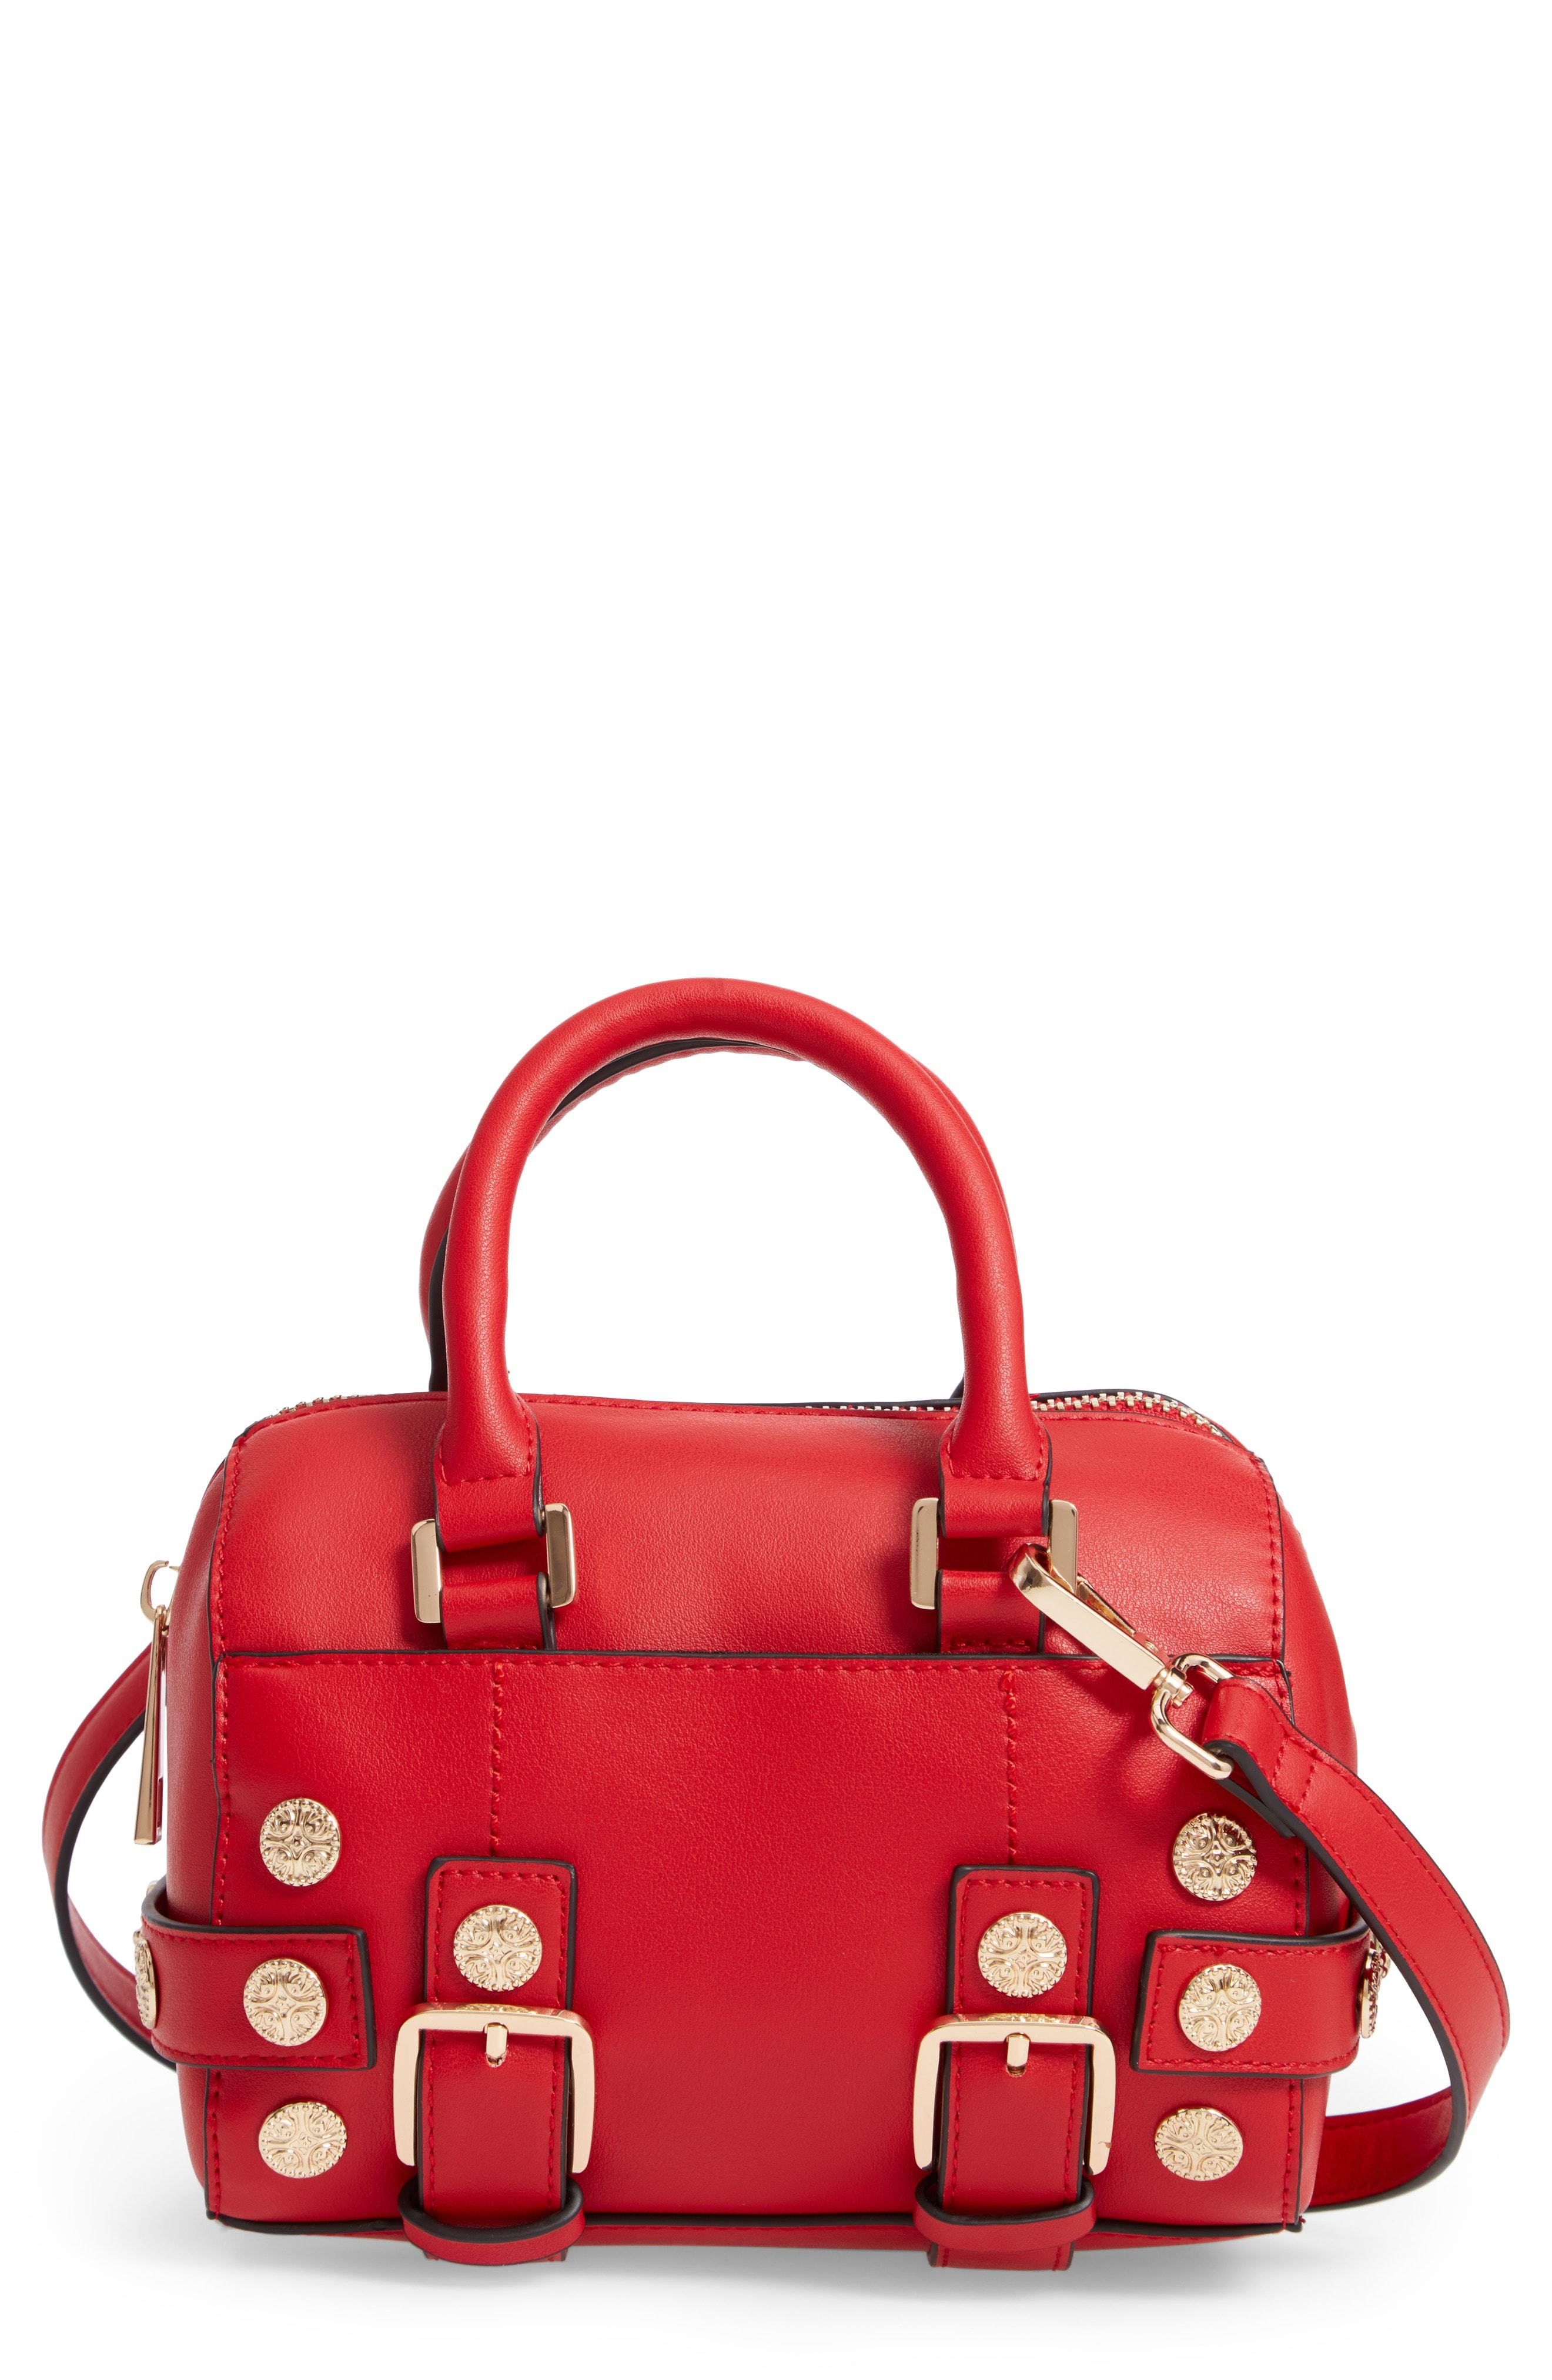 Topshop Bianca Studded Faux Leather Bowler Bag a845d41e5f4b7